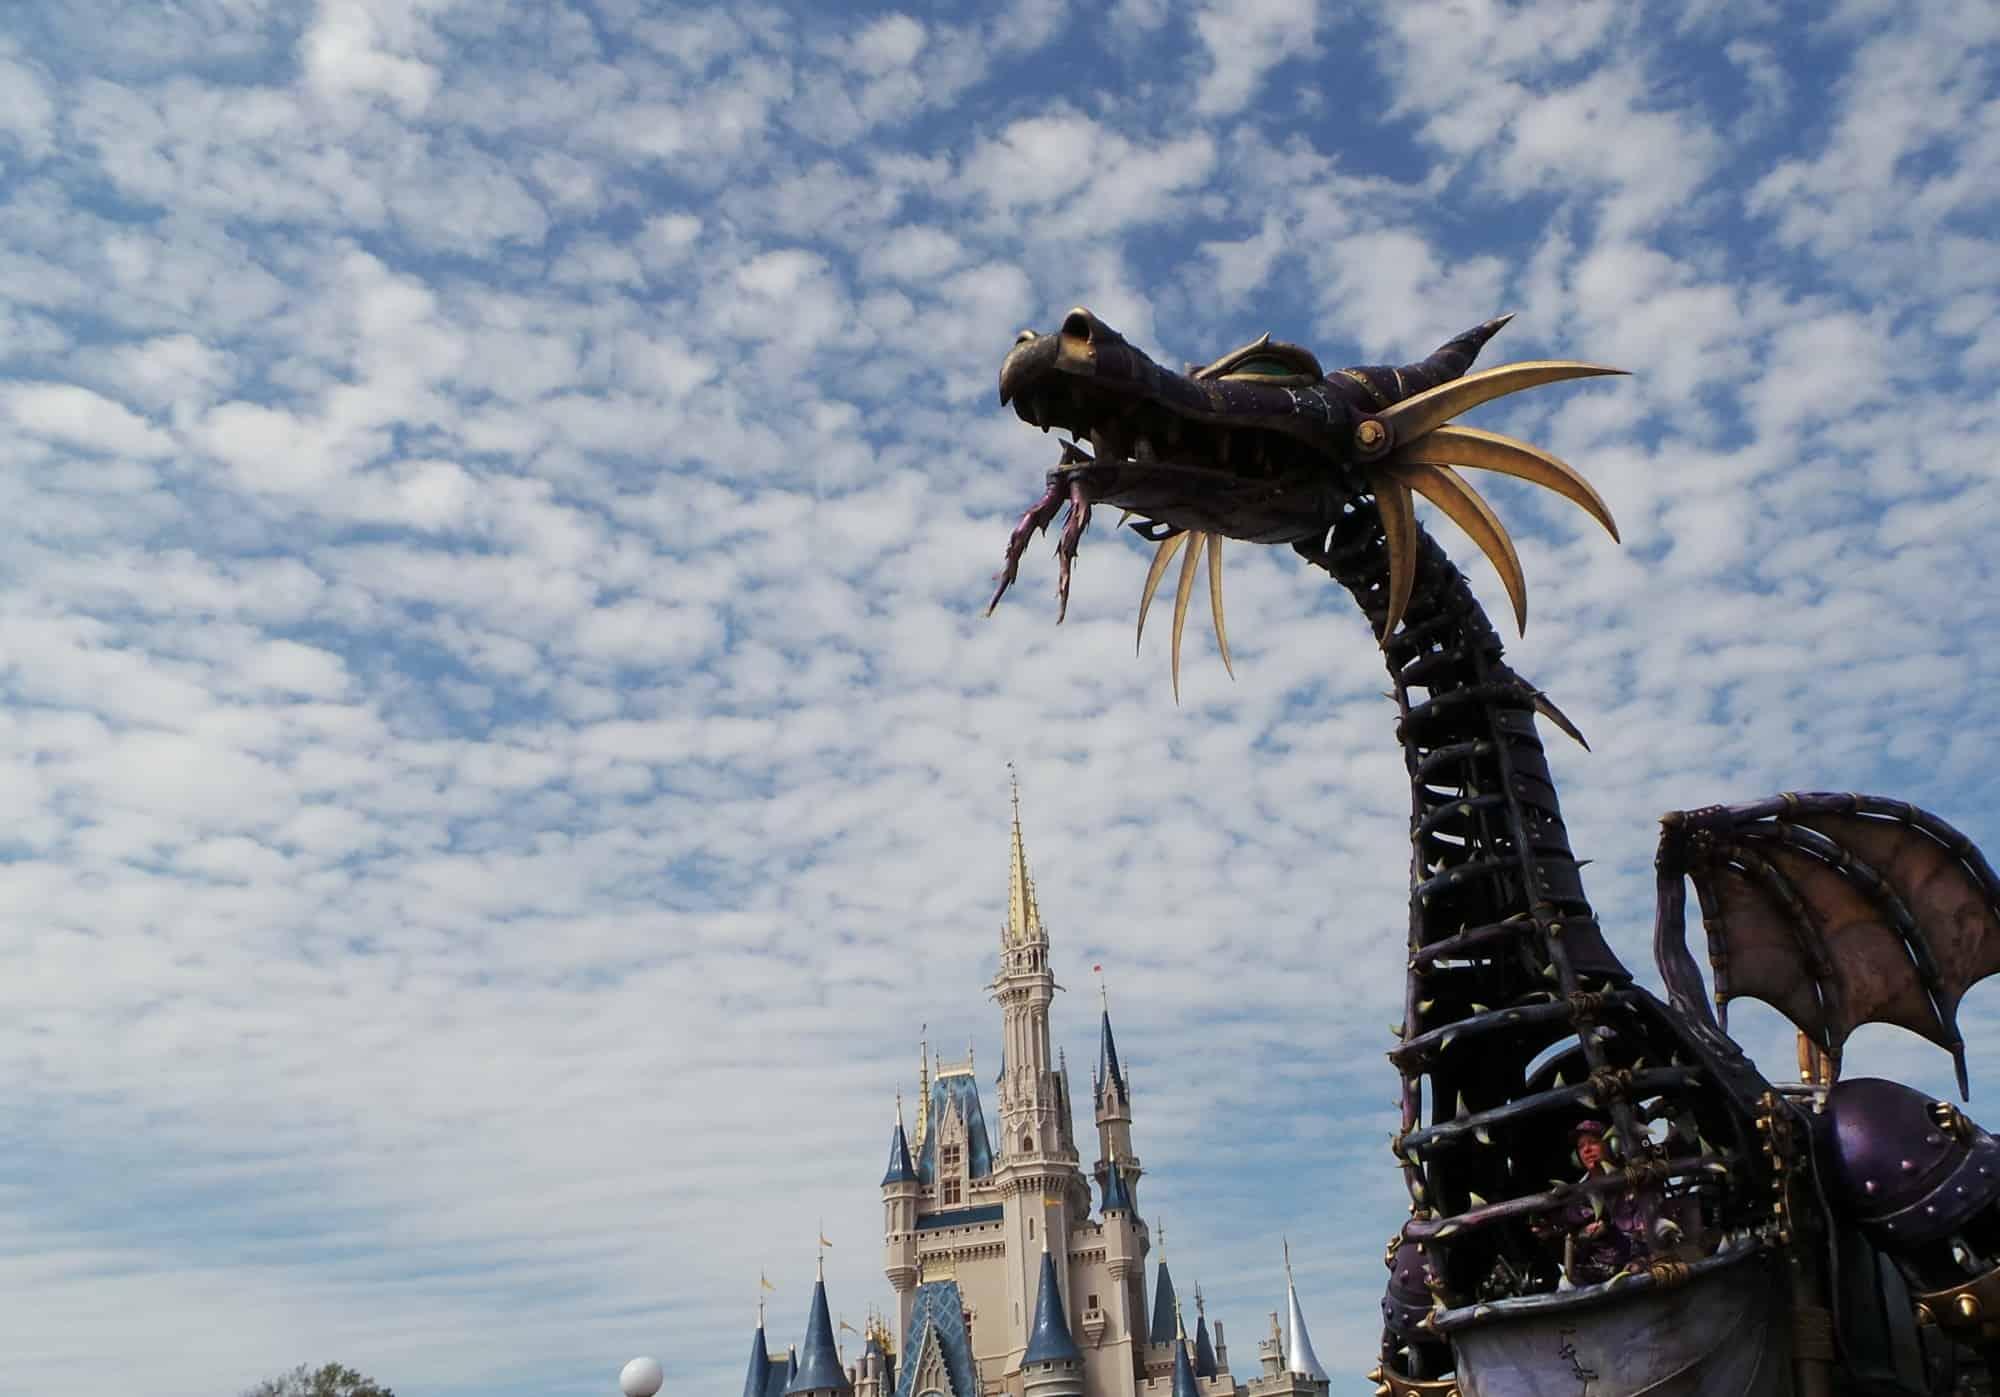 Festival of Fantasy Maleficent